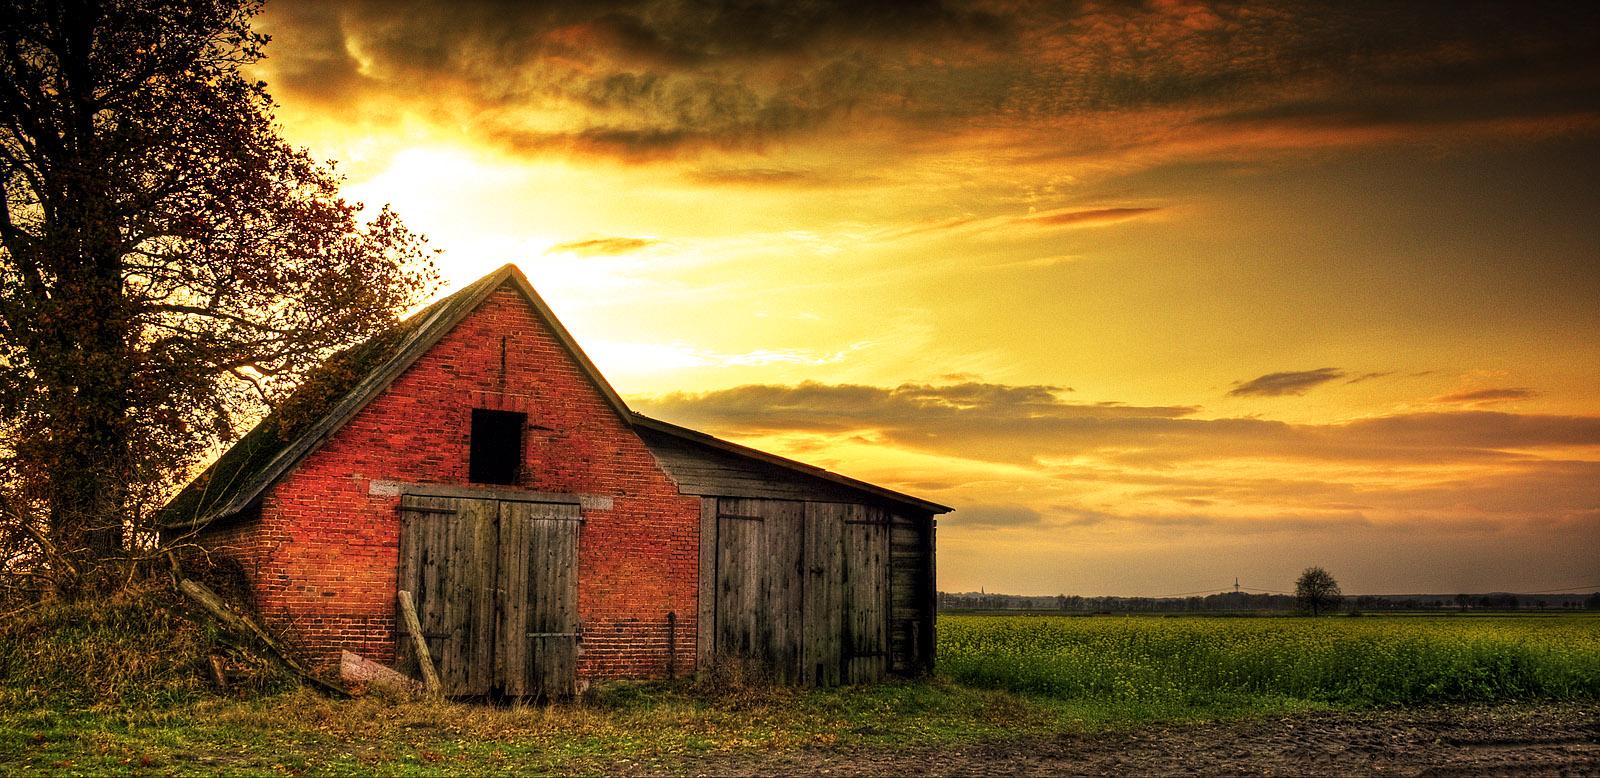 barn wallpaper - photo #24